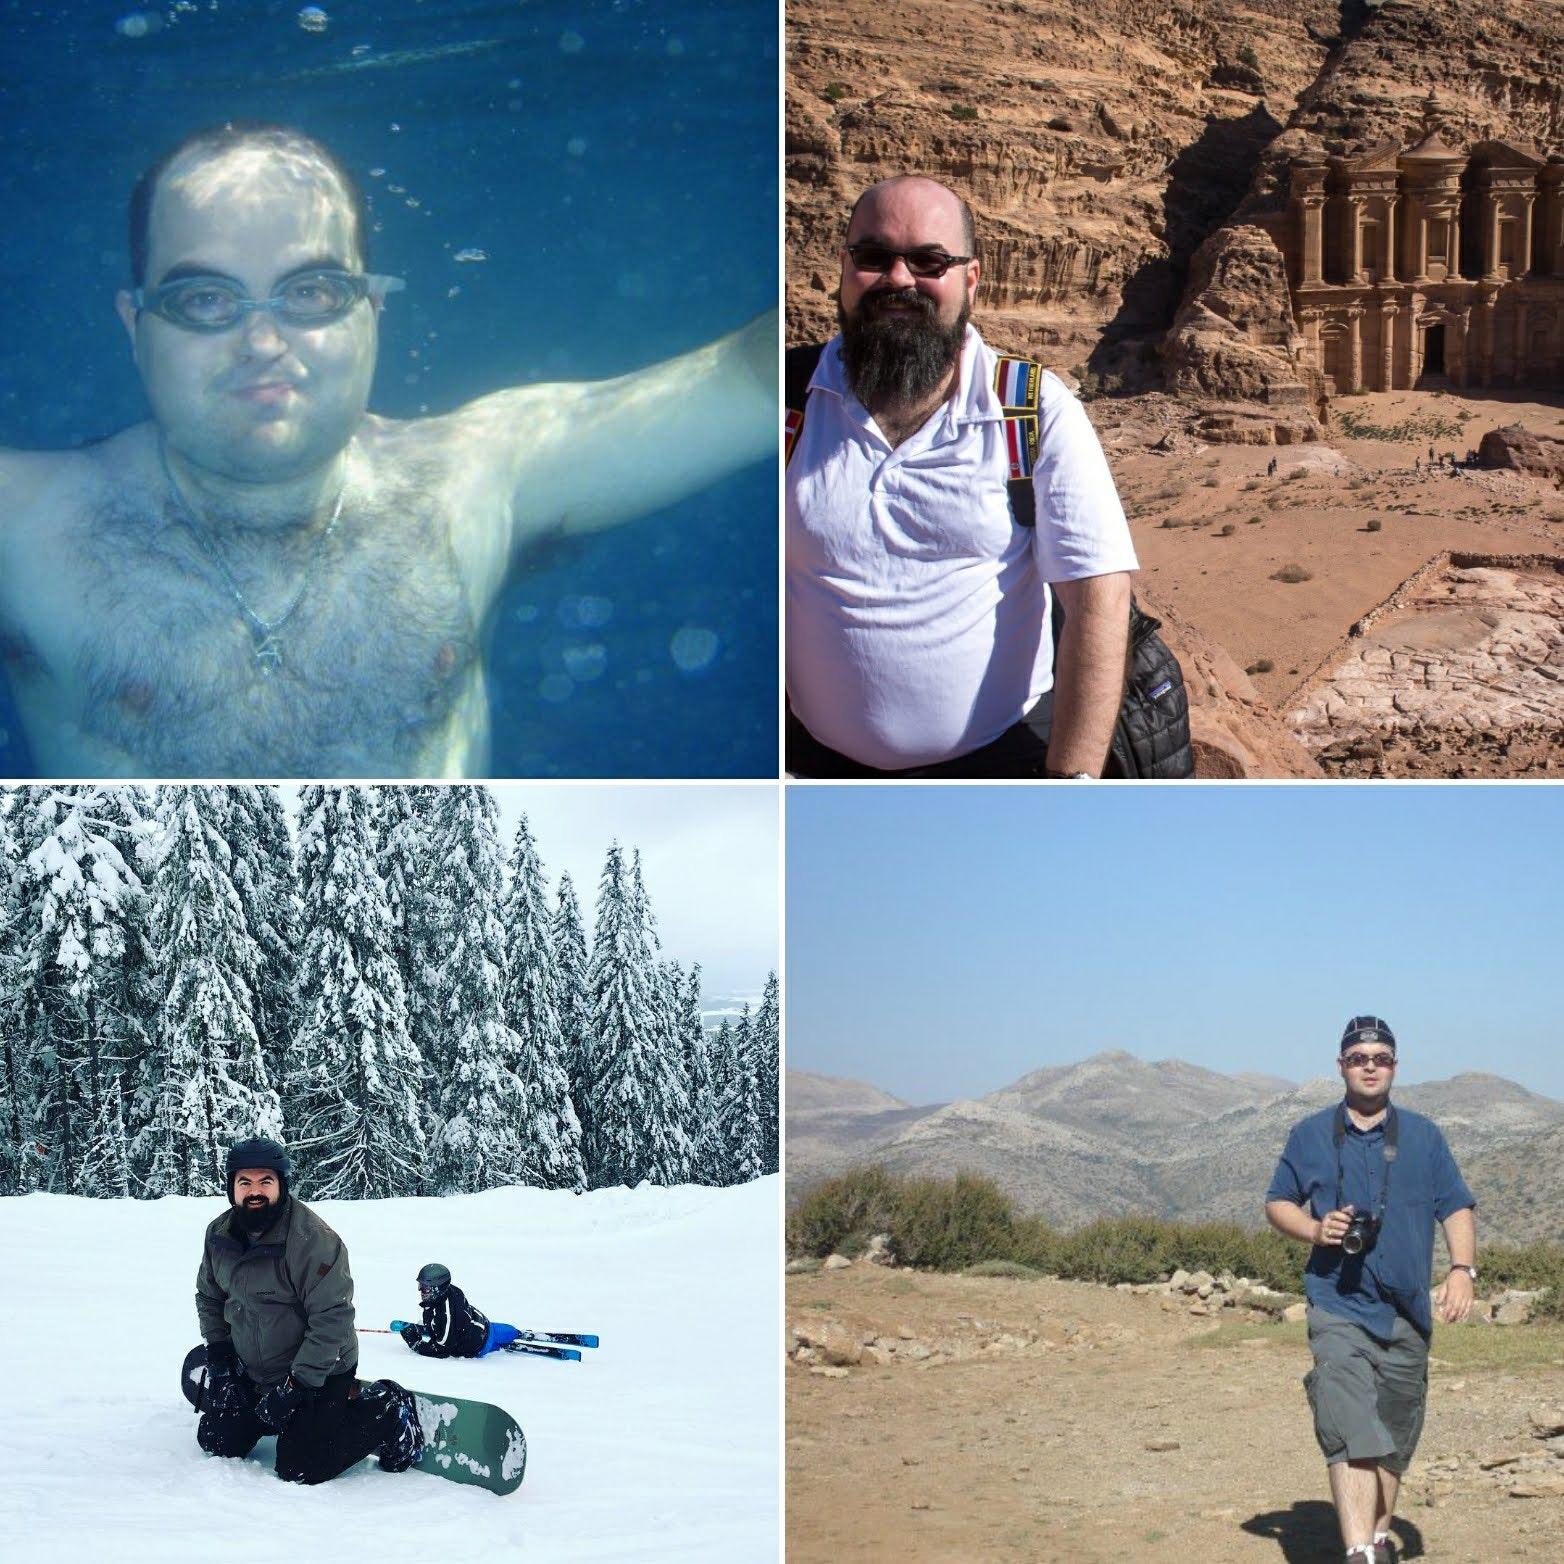 Egypt, Jordan, Sweden, Greece